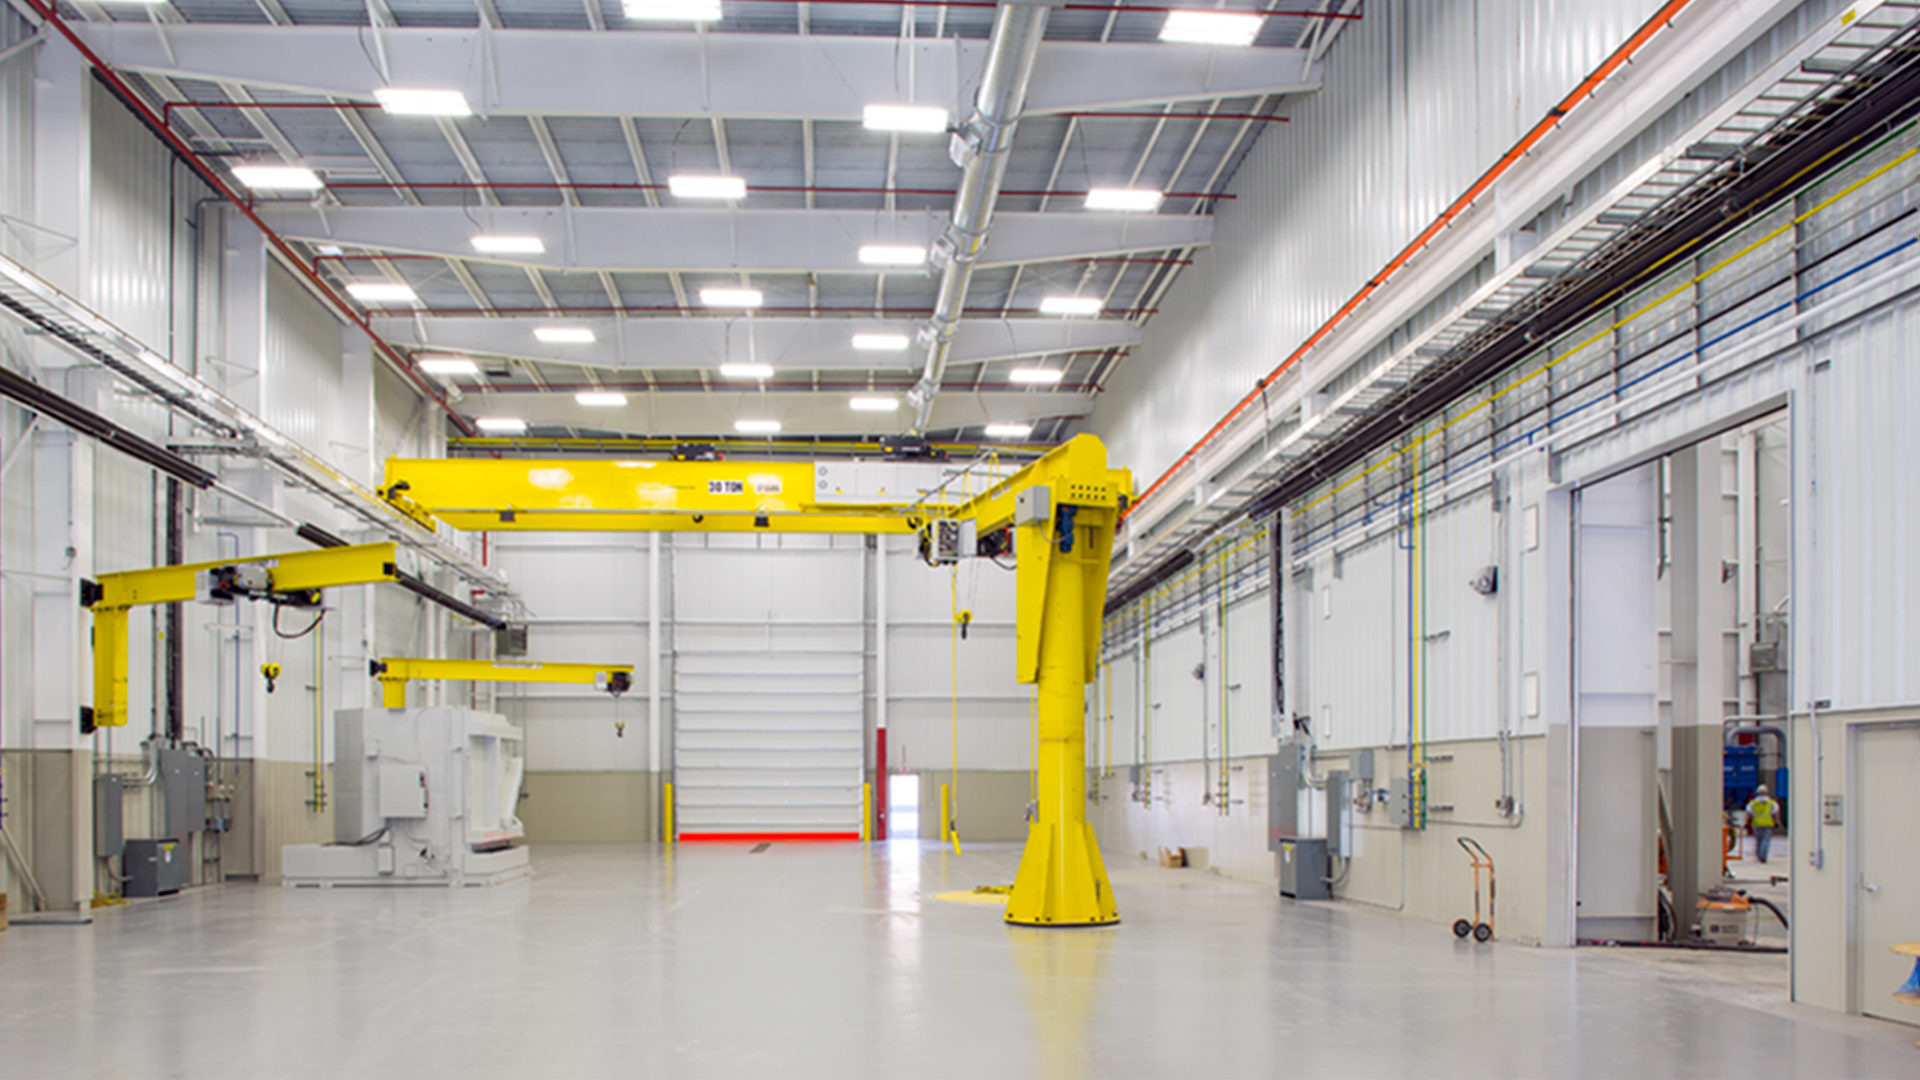 JoyGlobal Virginia Manufacturing Warehouse Interior Spotless White Warehouse